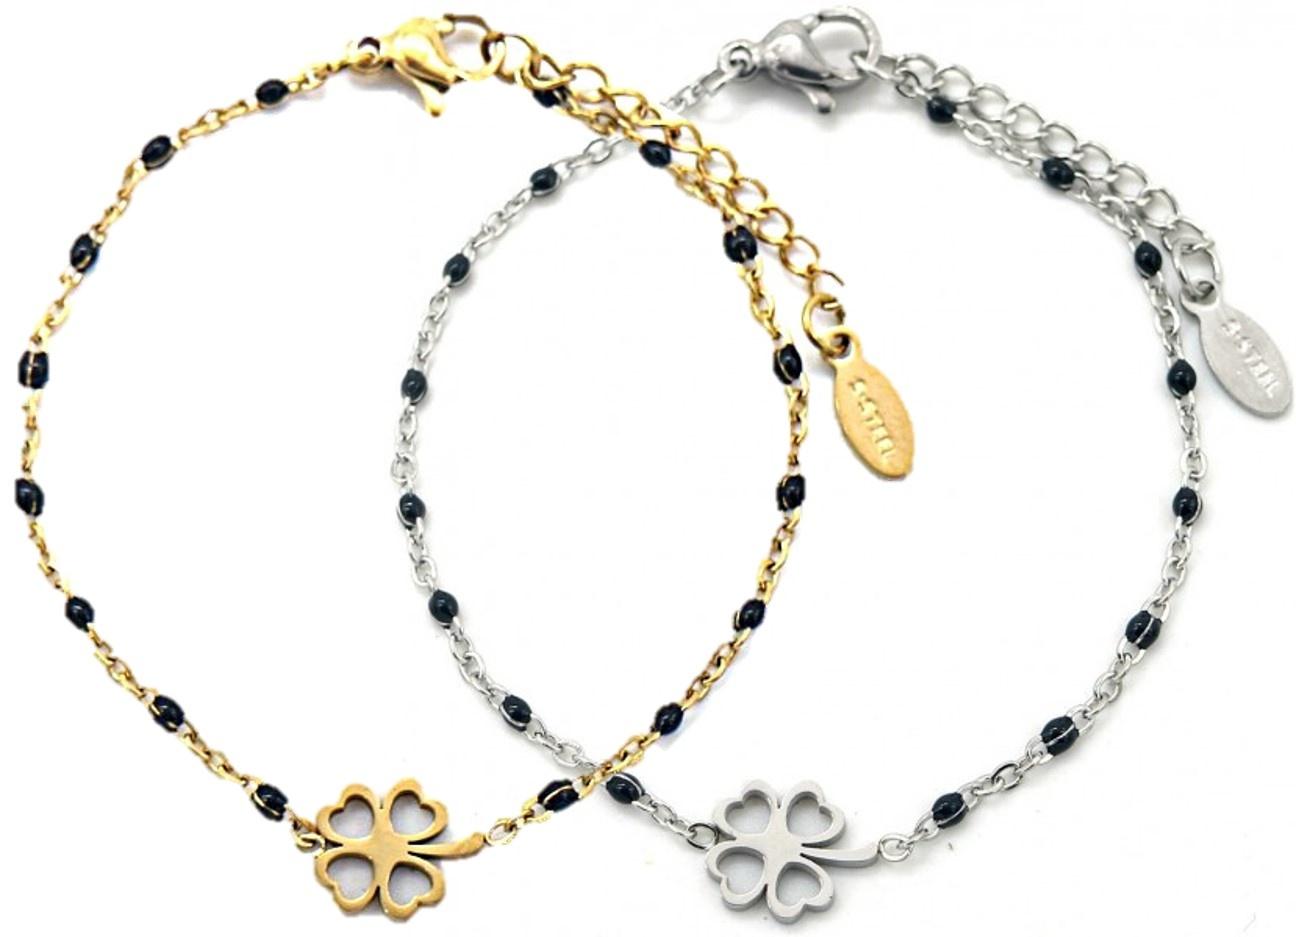 "Sazou Jewels Armband ""Geluk"" Stainless Steel Goud of Zilver"